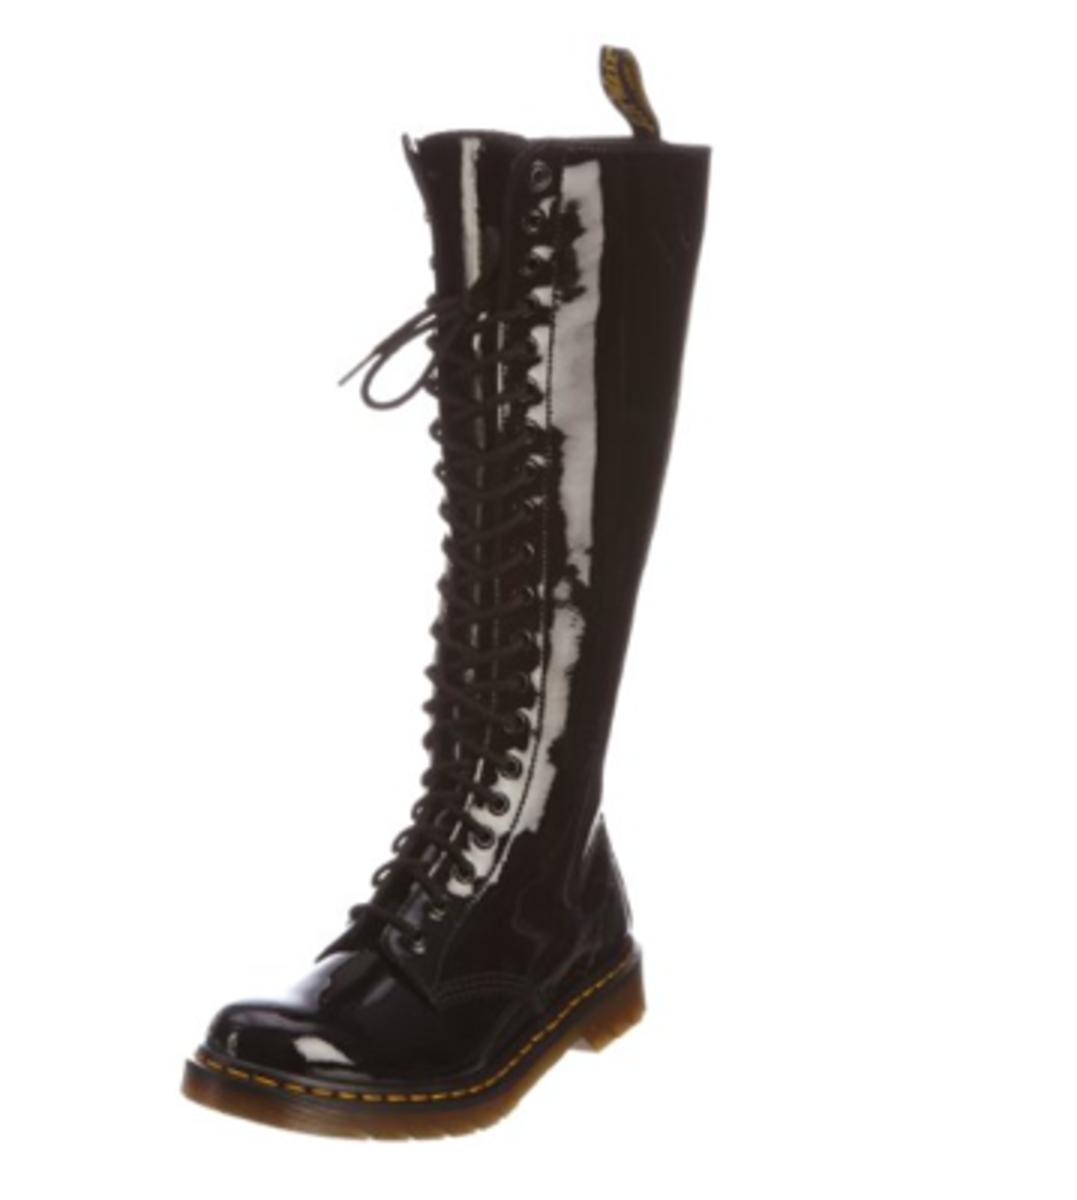 Dr. Marten's Women's 1B60 20-Eye Boot, Black - $199.99 on Amazon